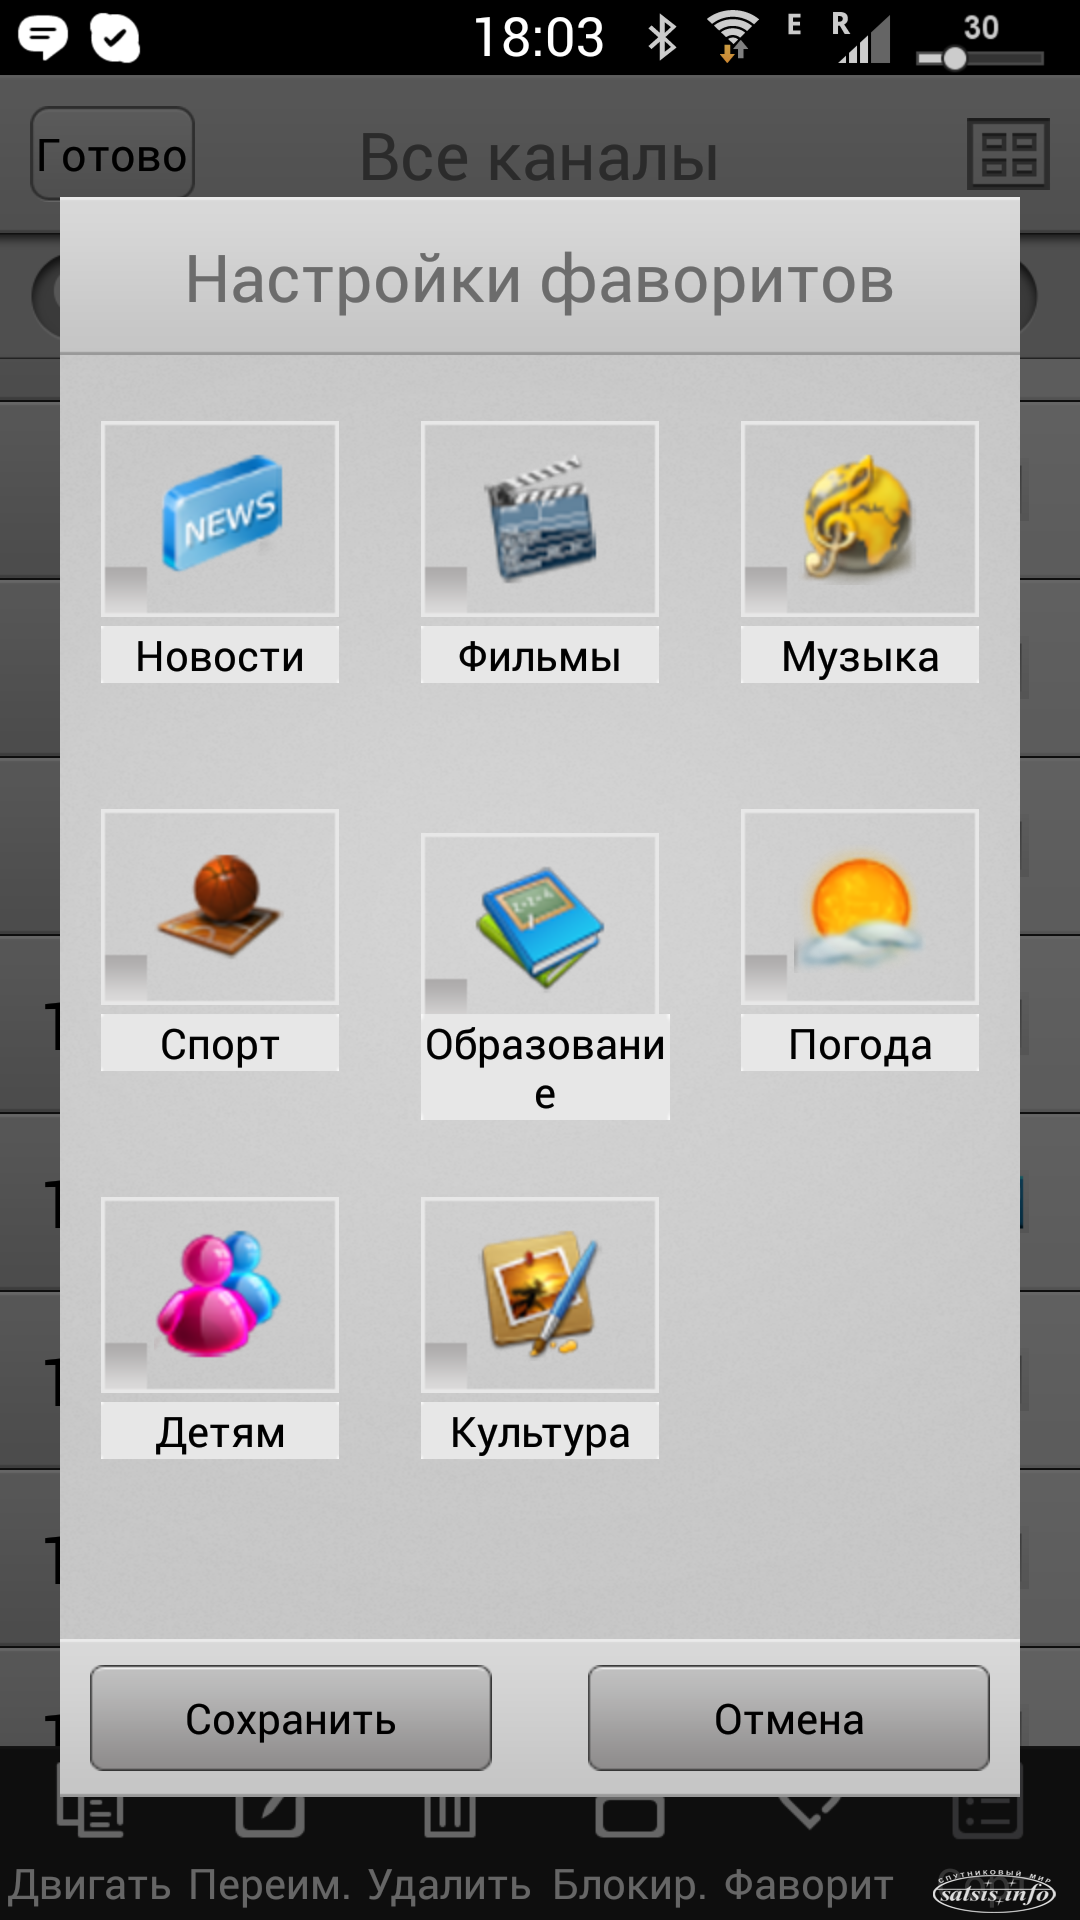 https://satsis.info/uploads/forum/posts/2014-06/1401808322_www.satsis.info_g_mscreen_4.png